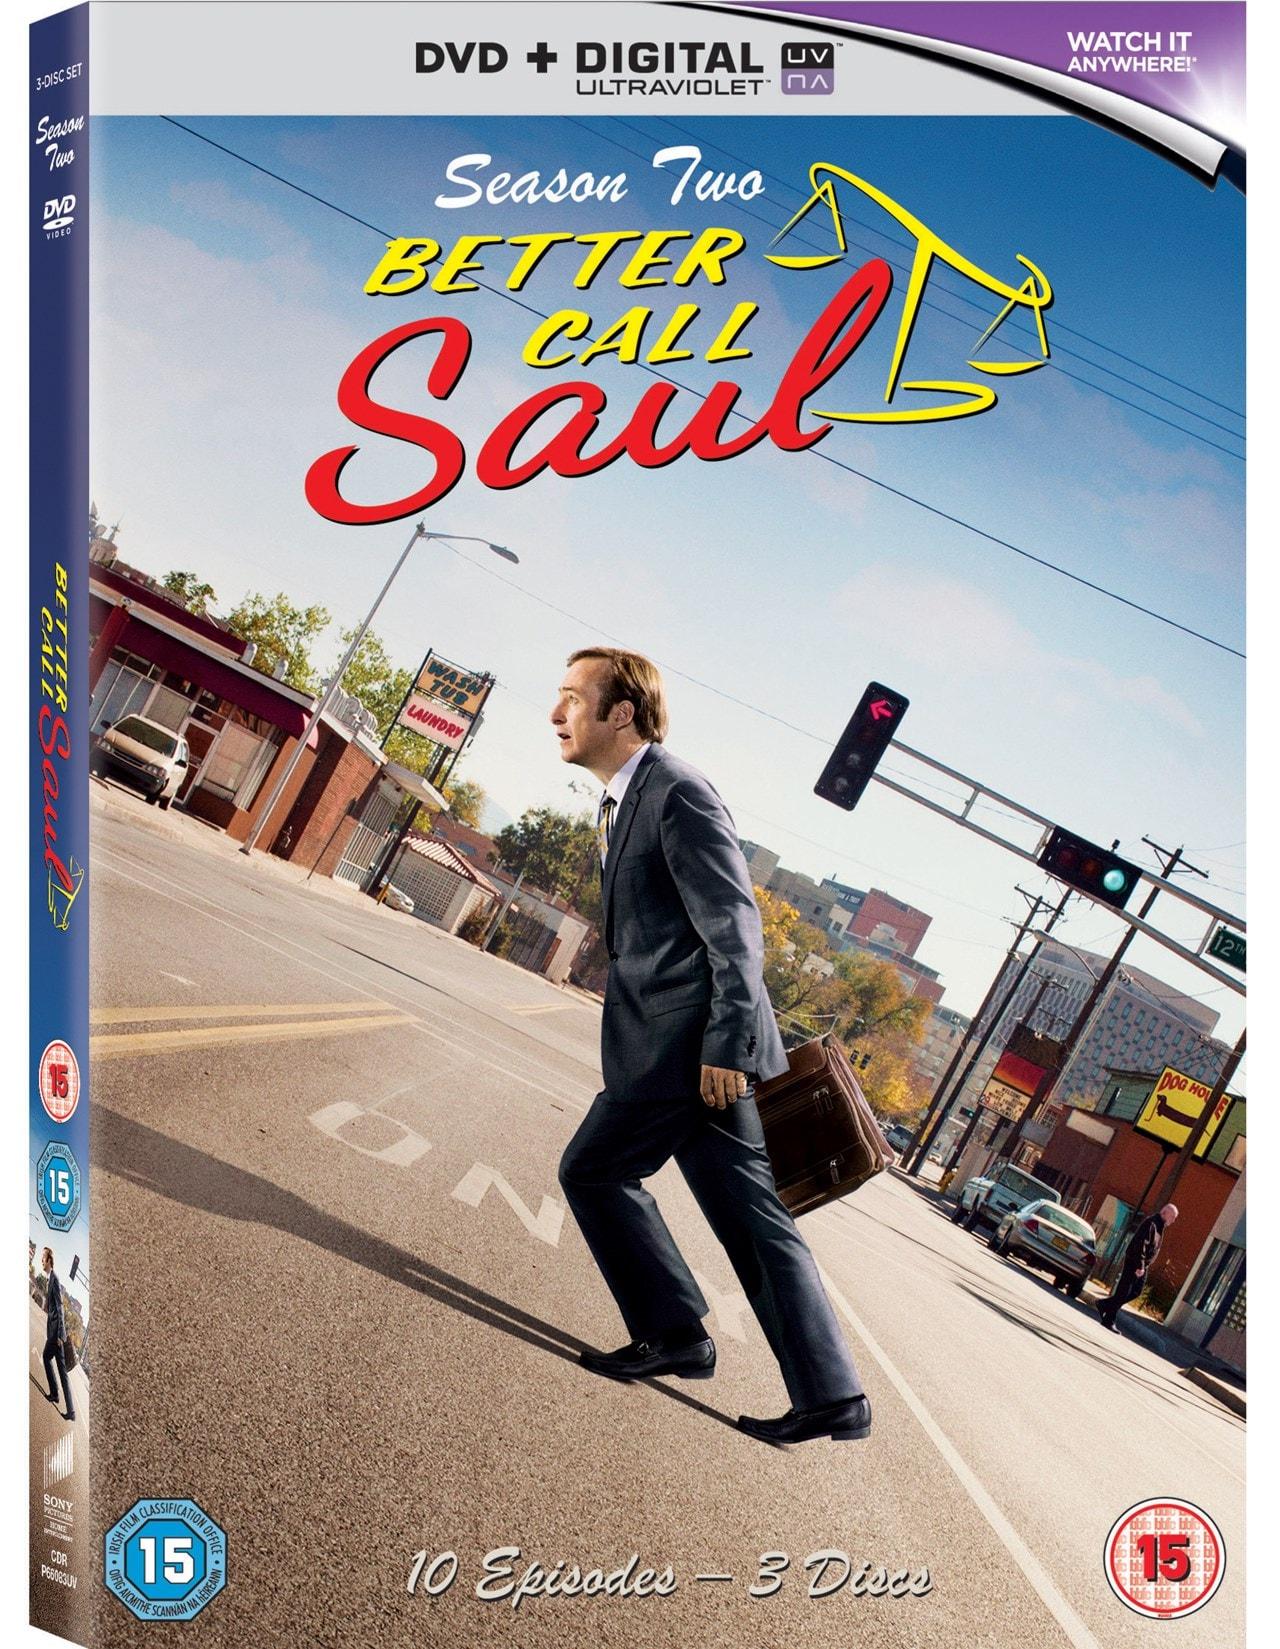 Better Call Saul: Season Two - 2